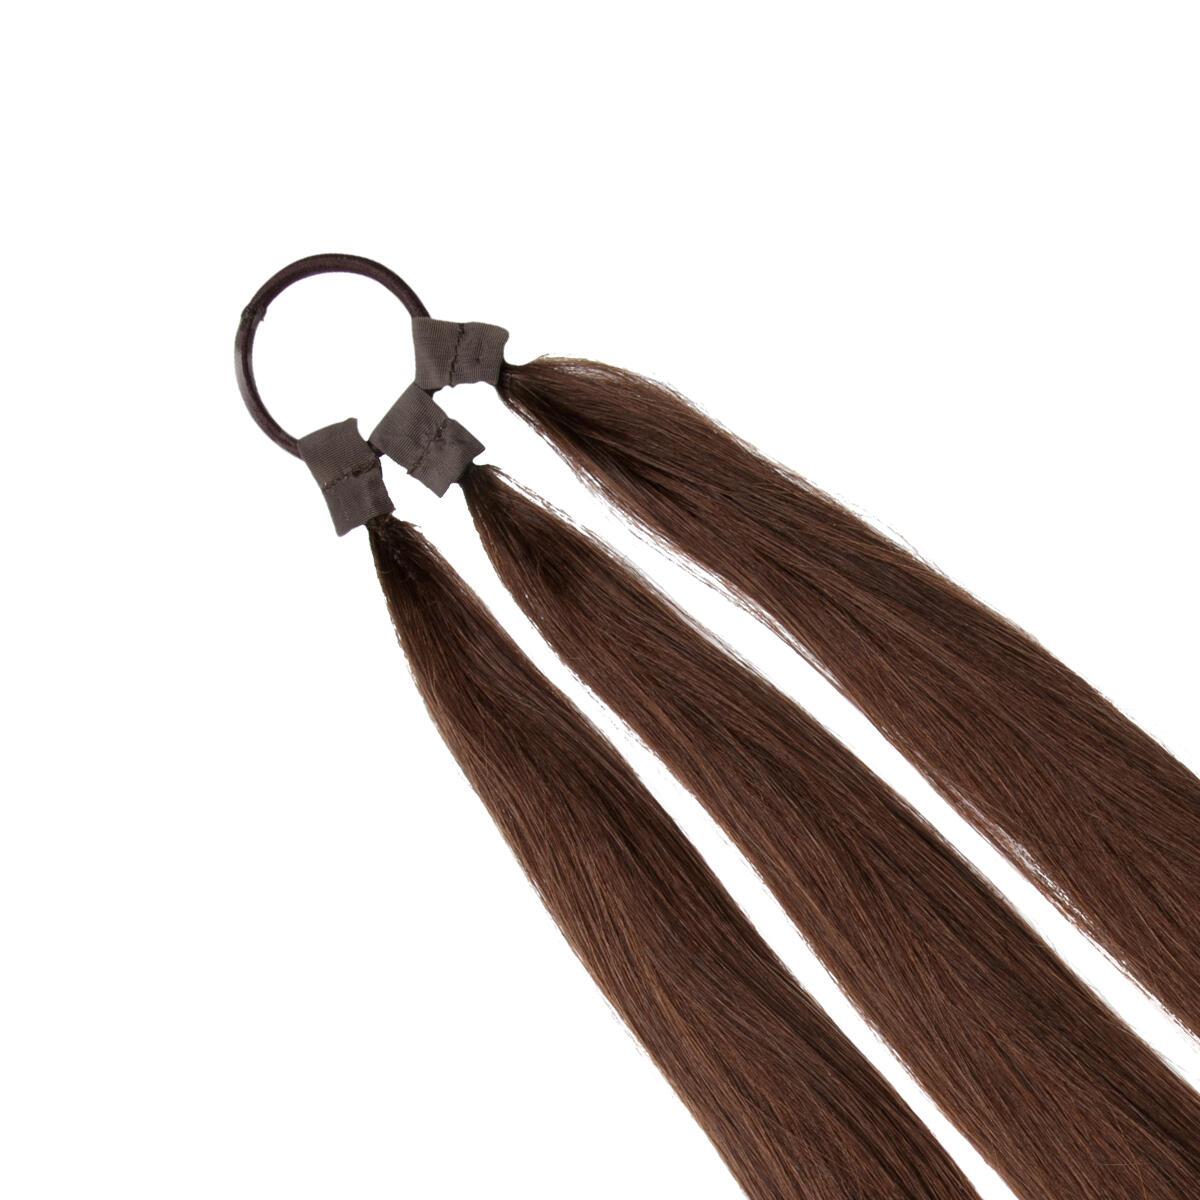 Easy Braid For voluminous braids 2.0 Dark Brown 55 cm